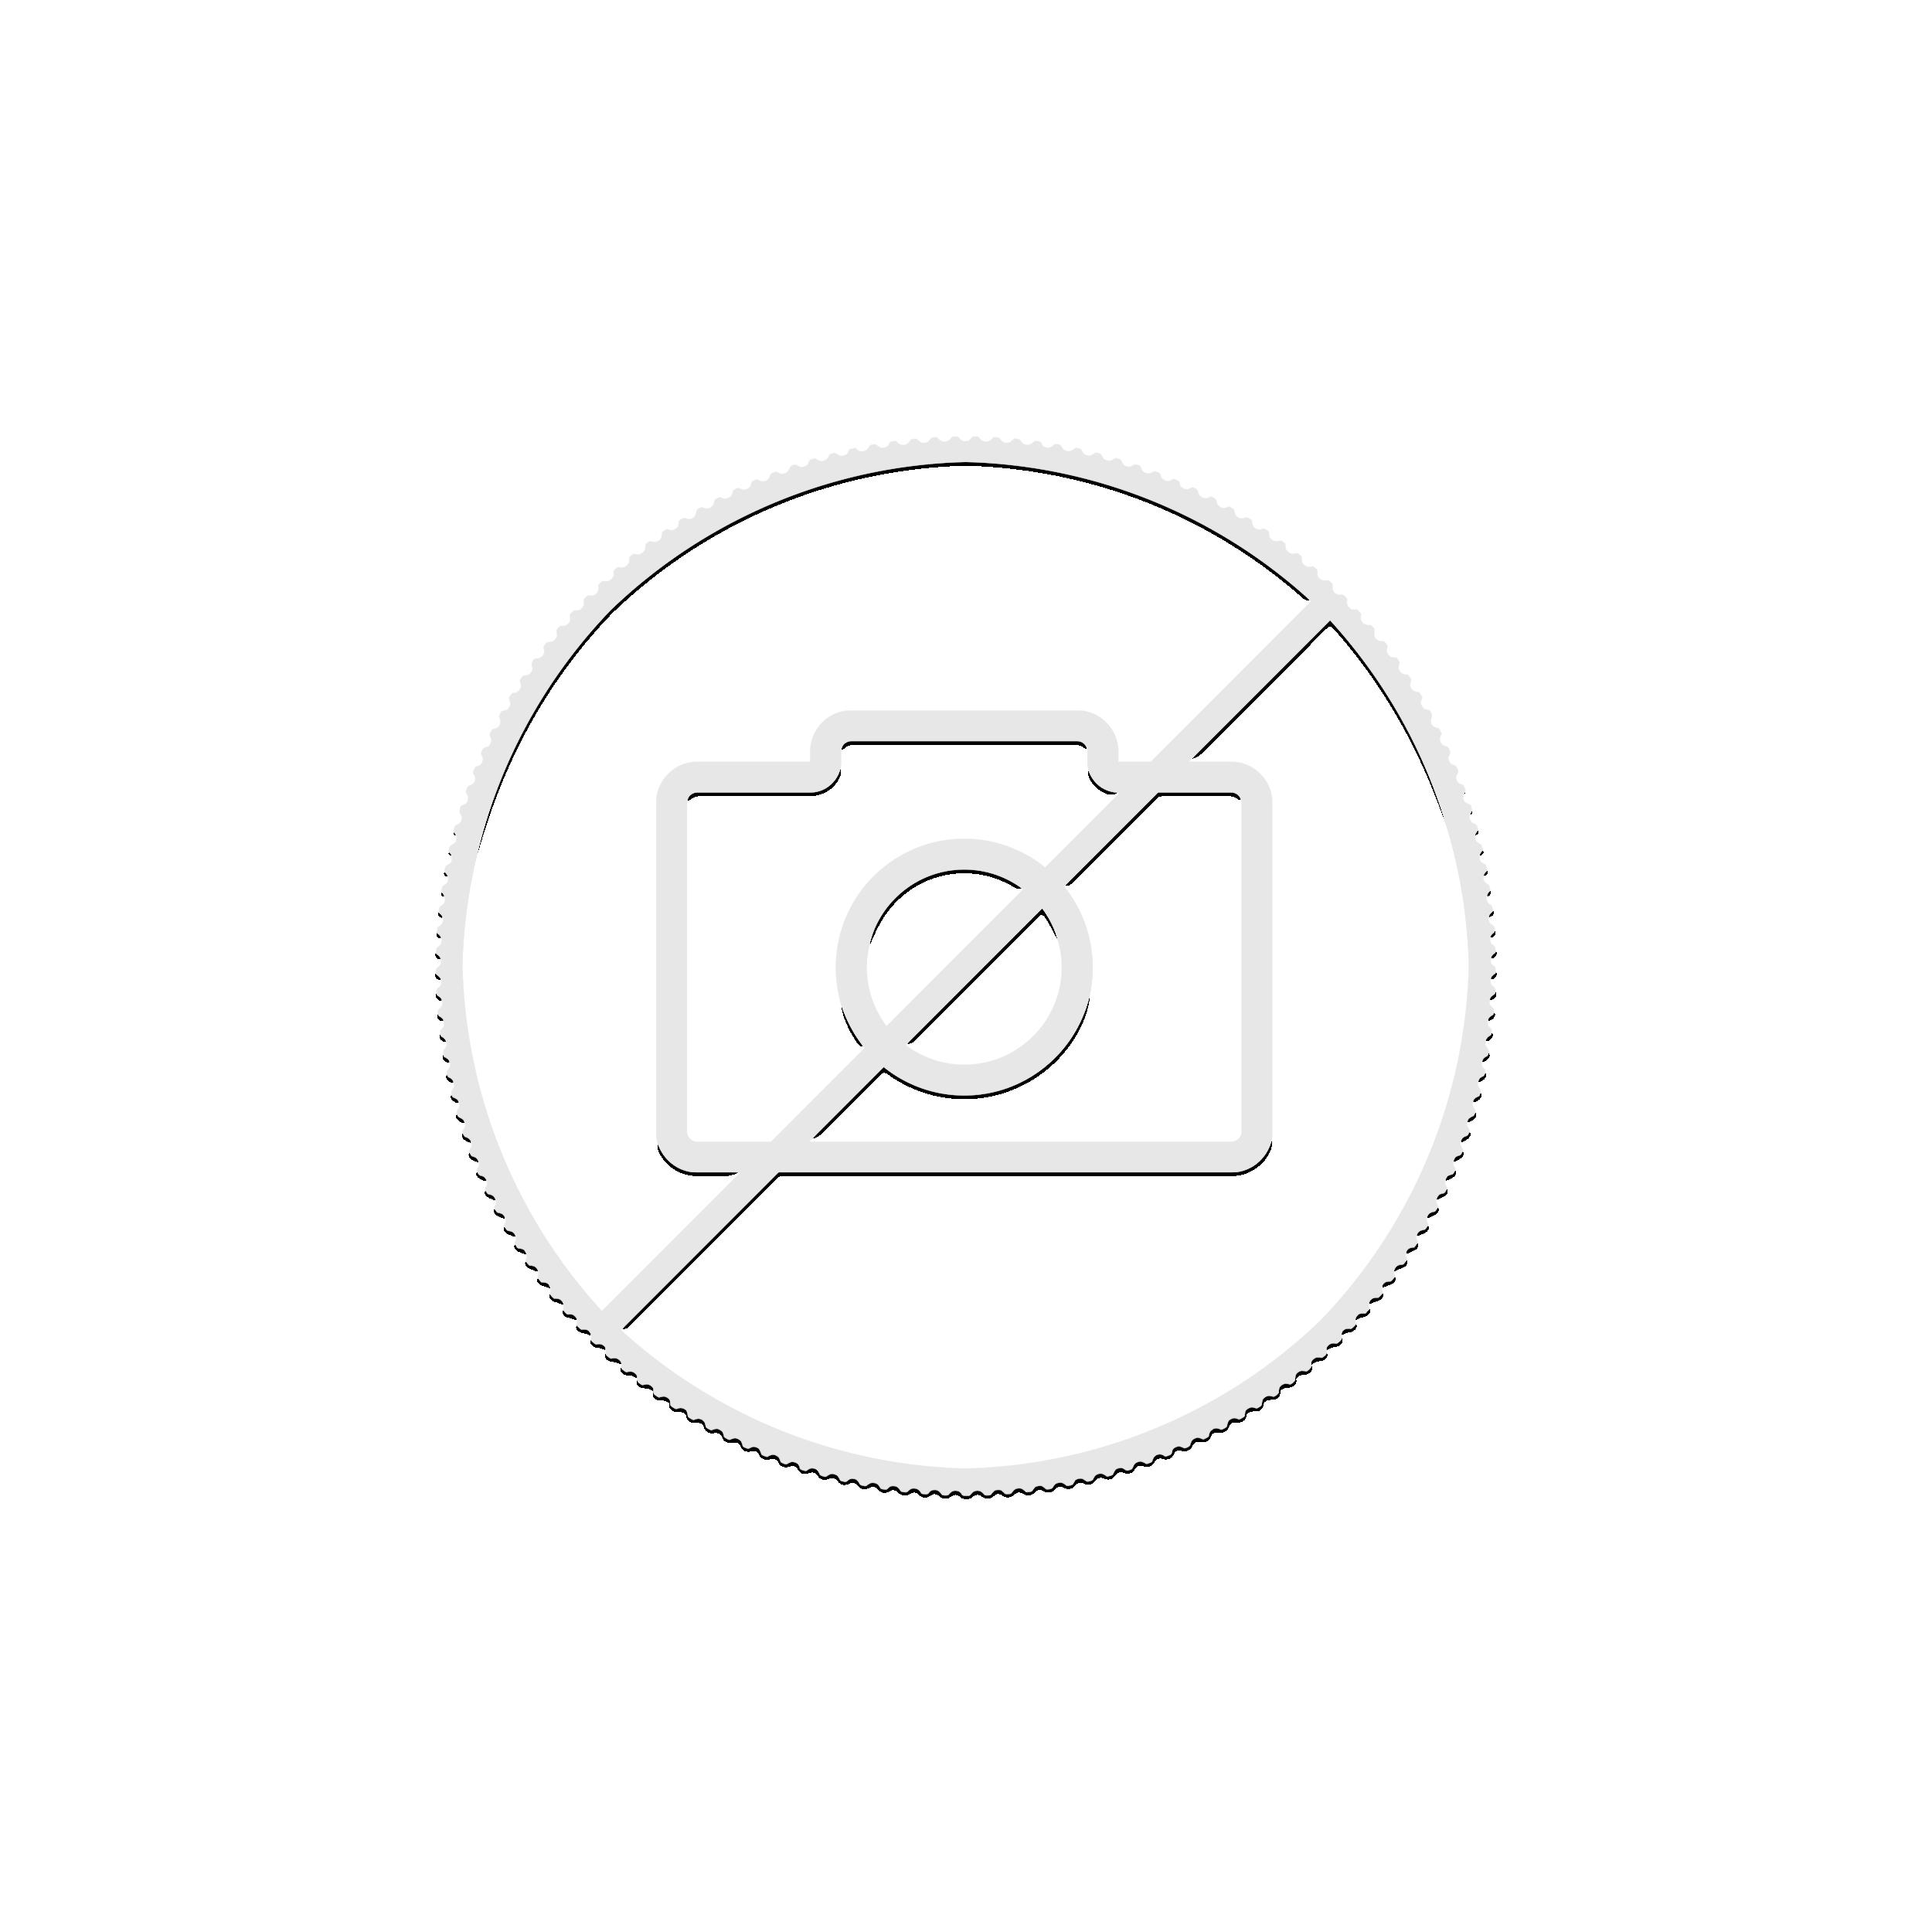 Set zilveren Panda 1 troy ounce munten 2012 t/m 2015